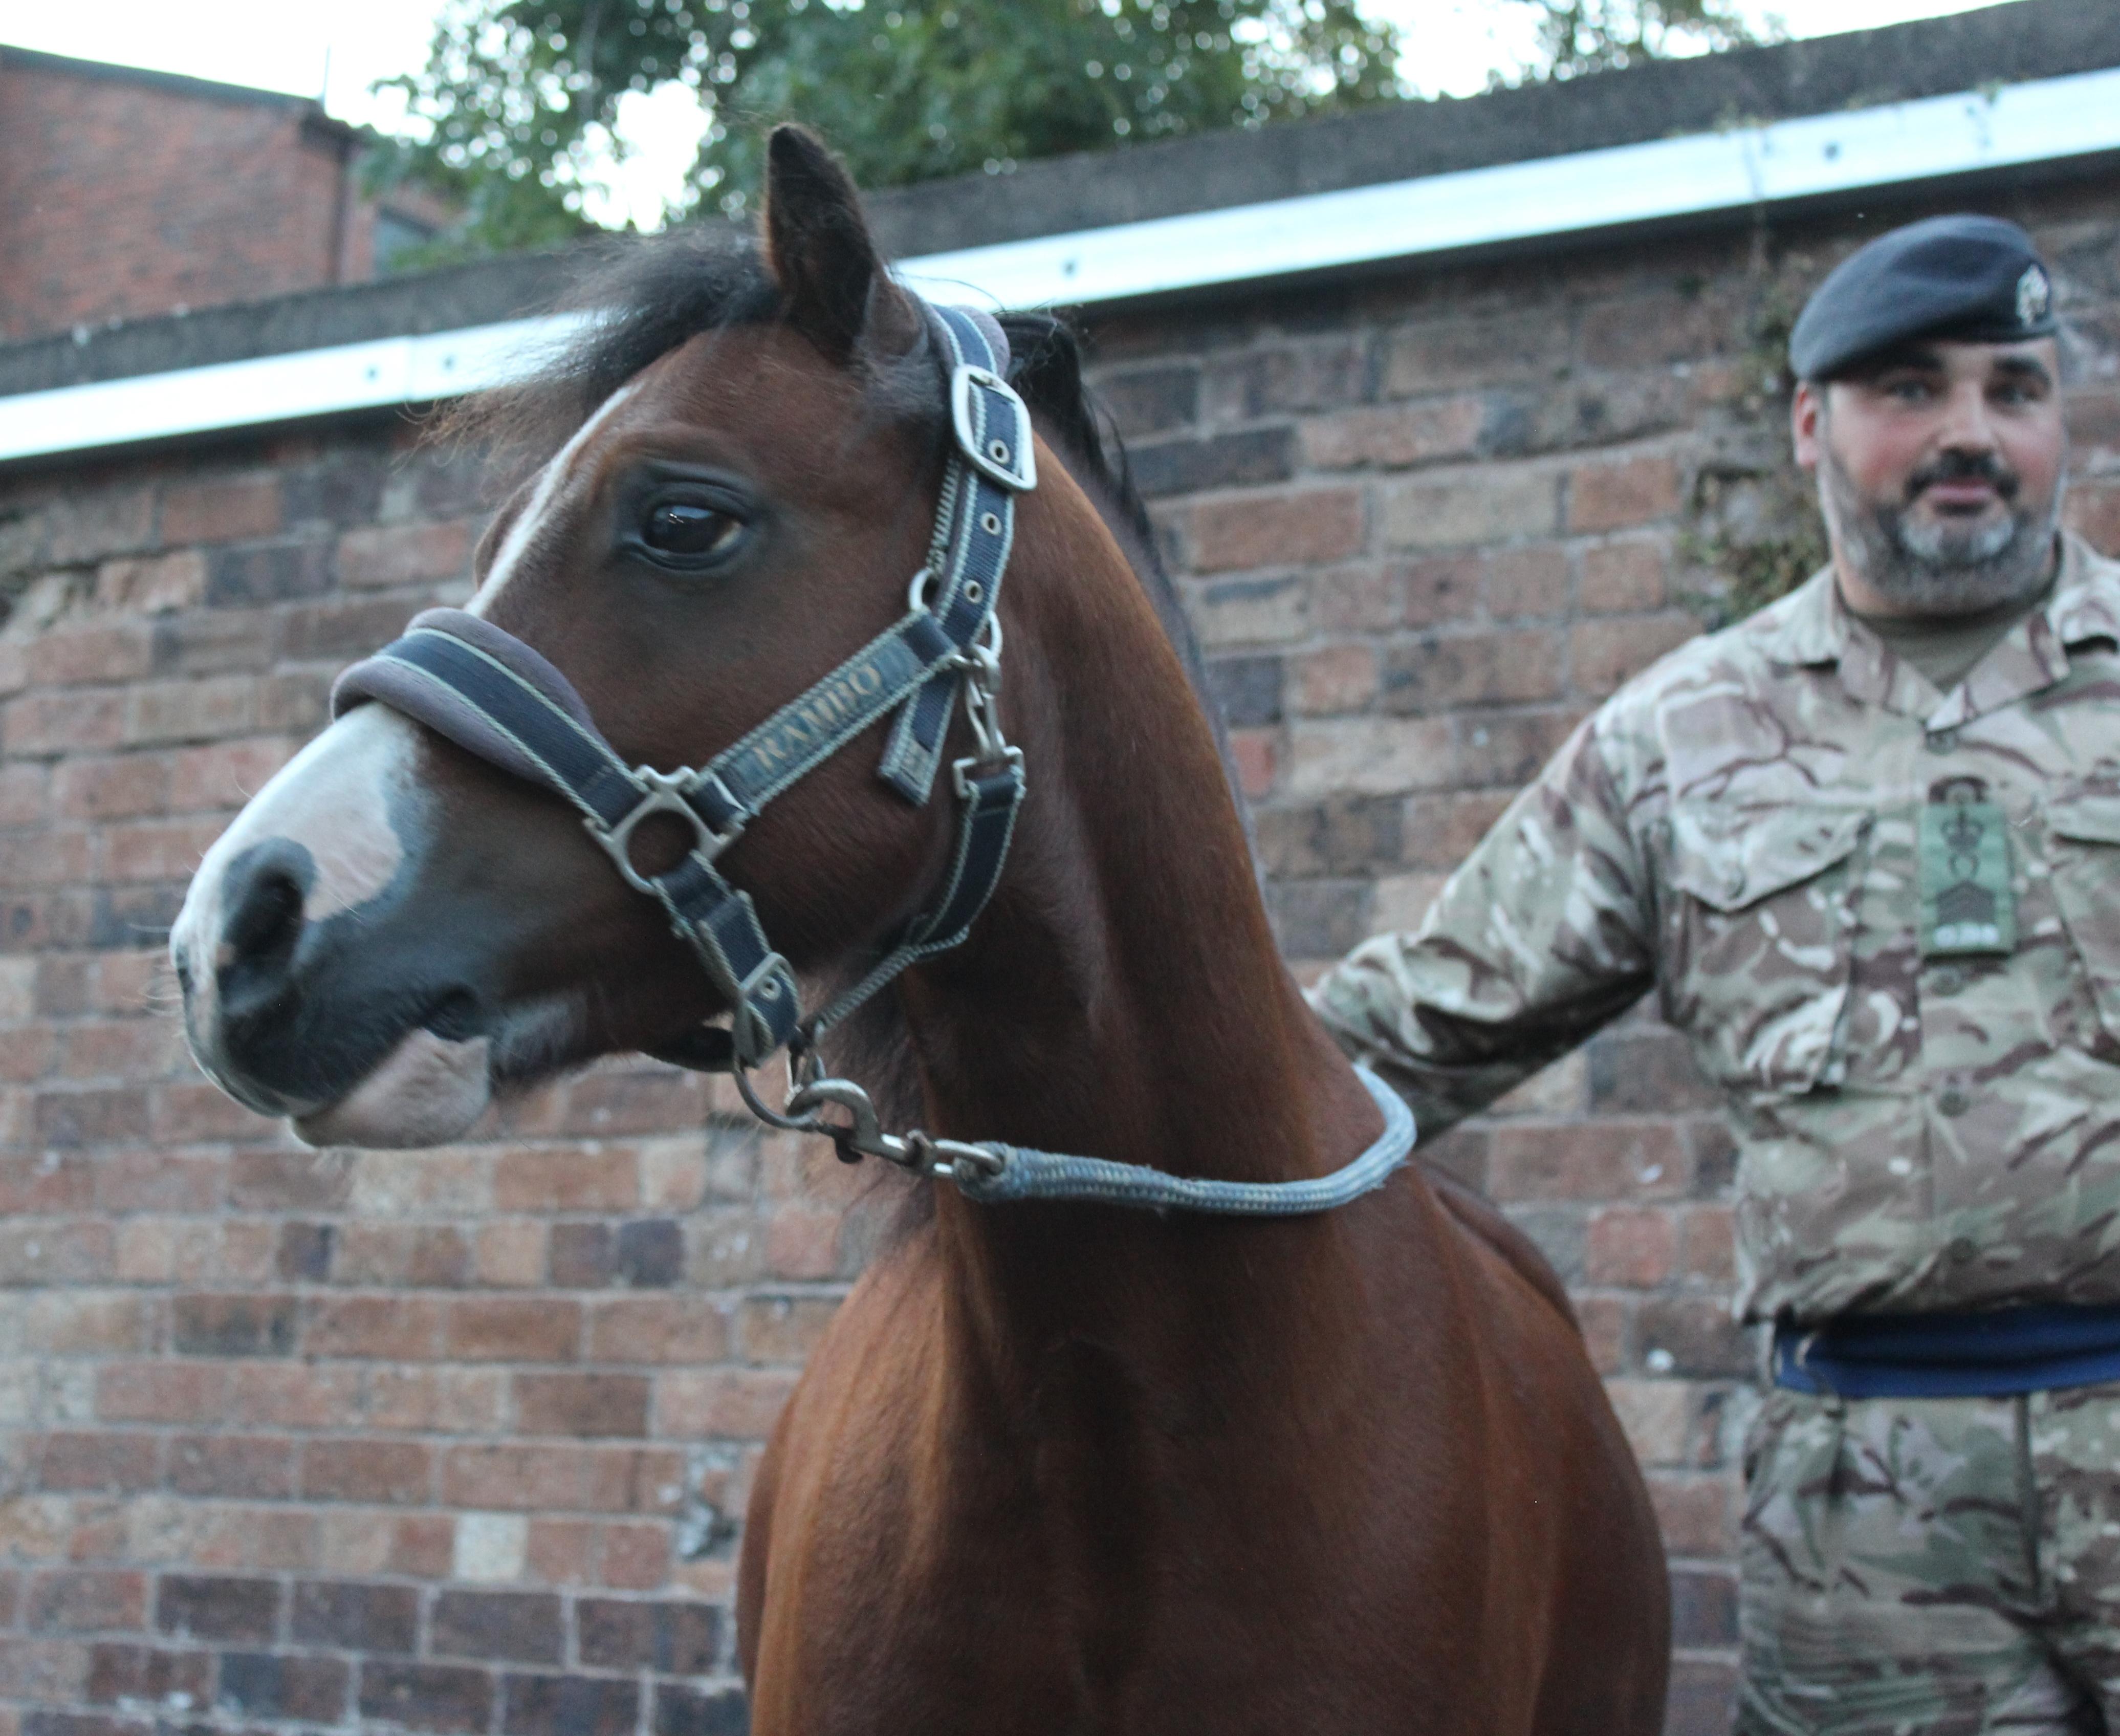 Lance Corporal Emrys Forlan Jones